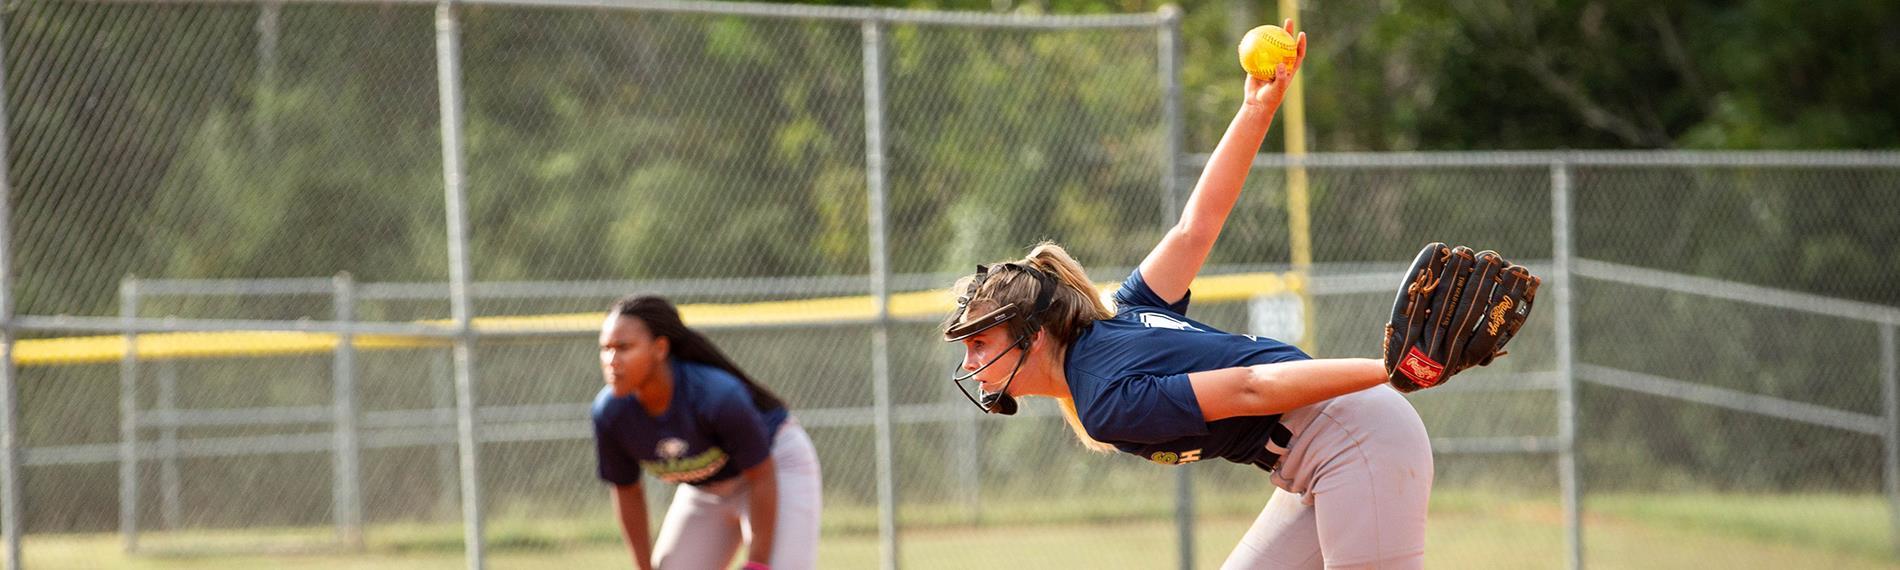 Furlow Softball